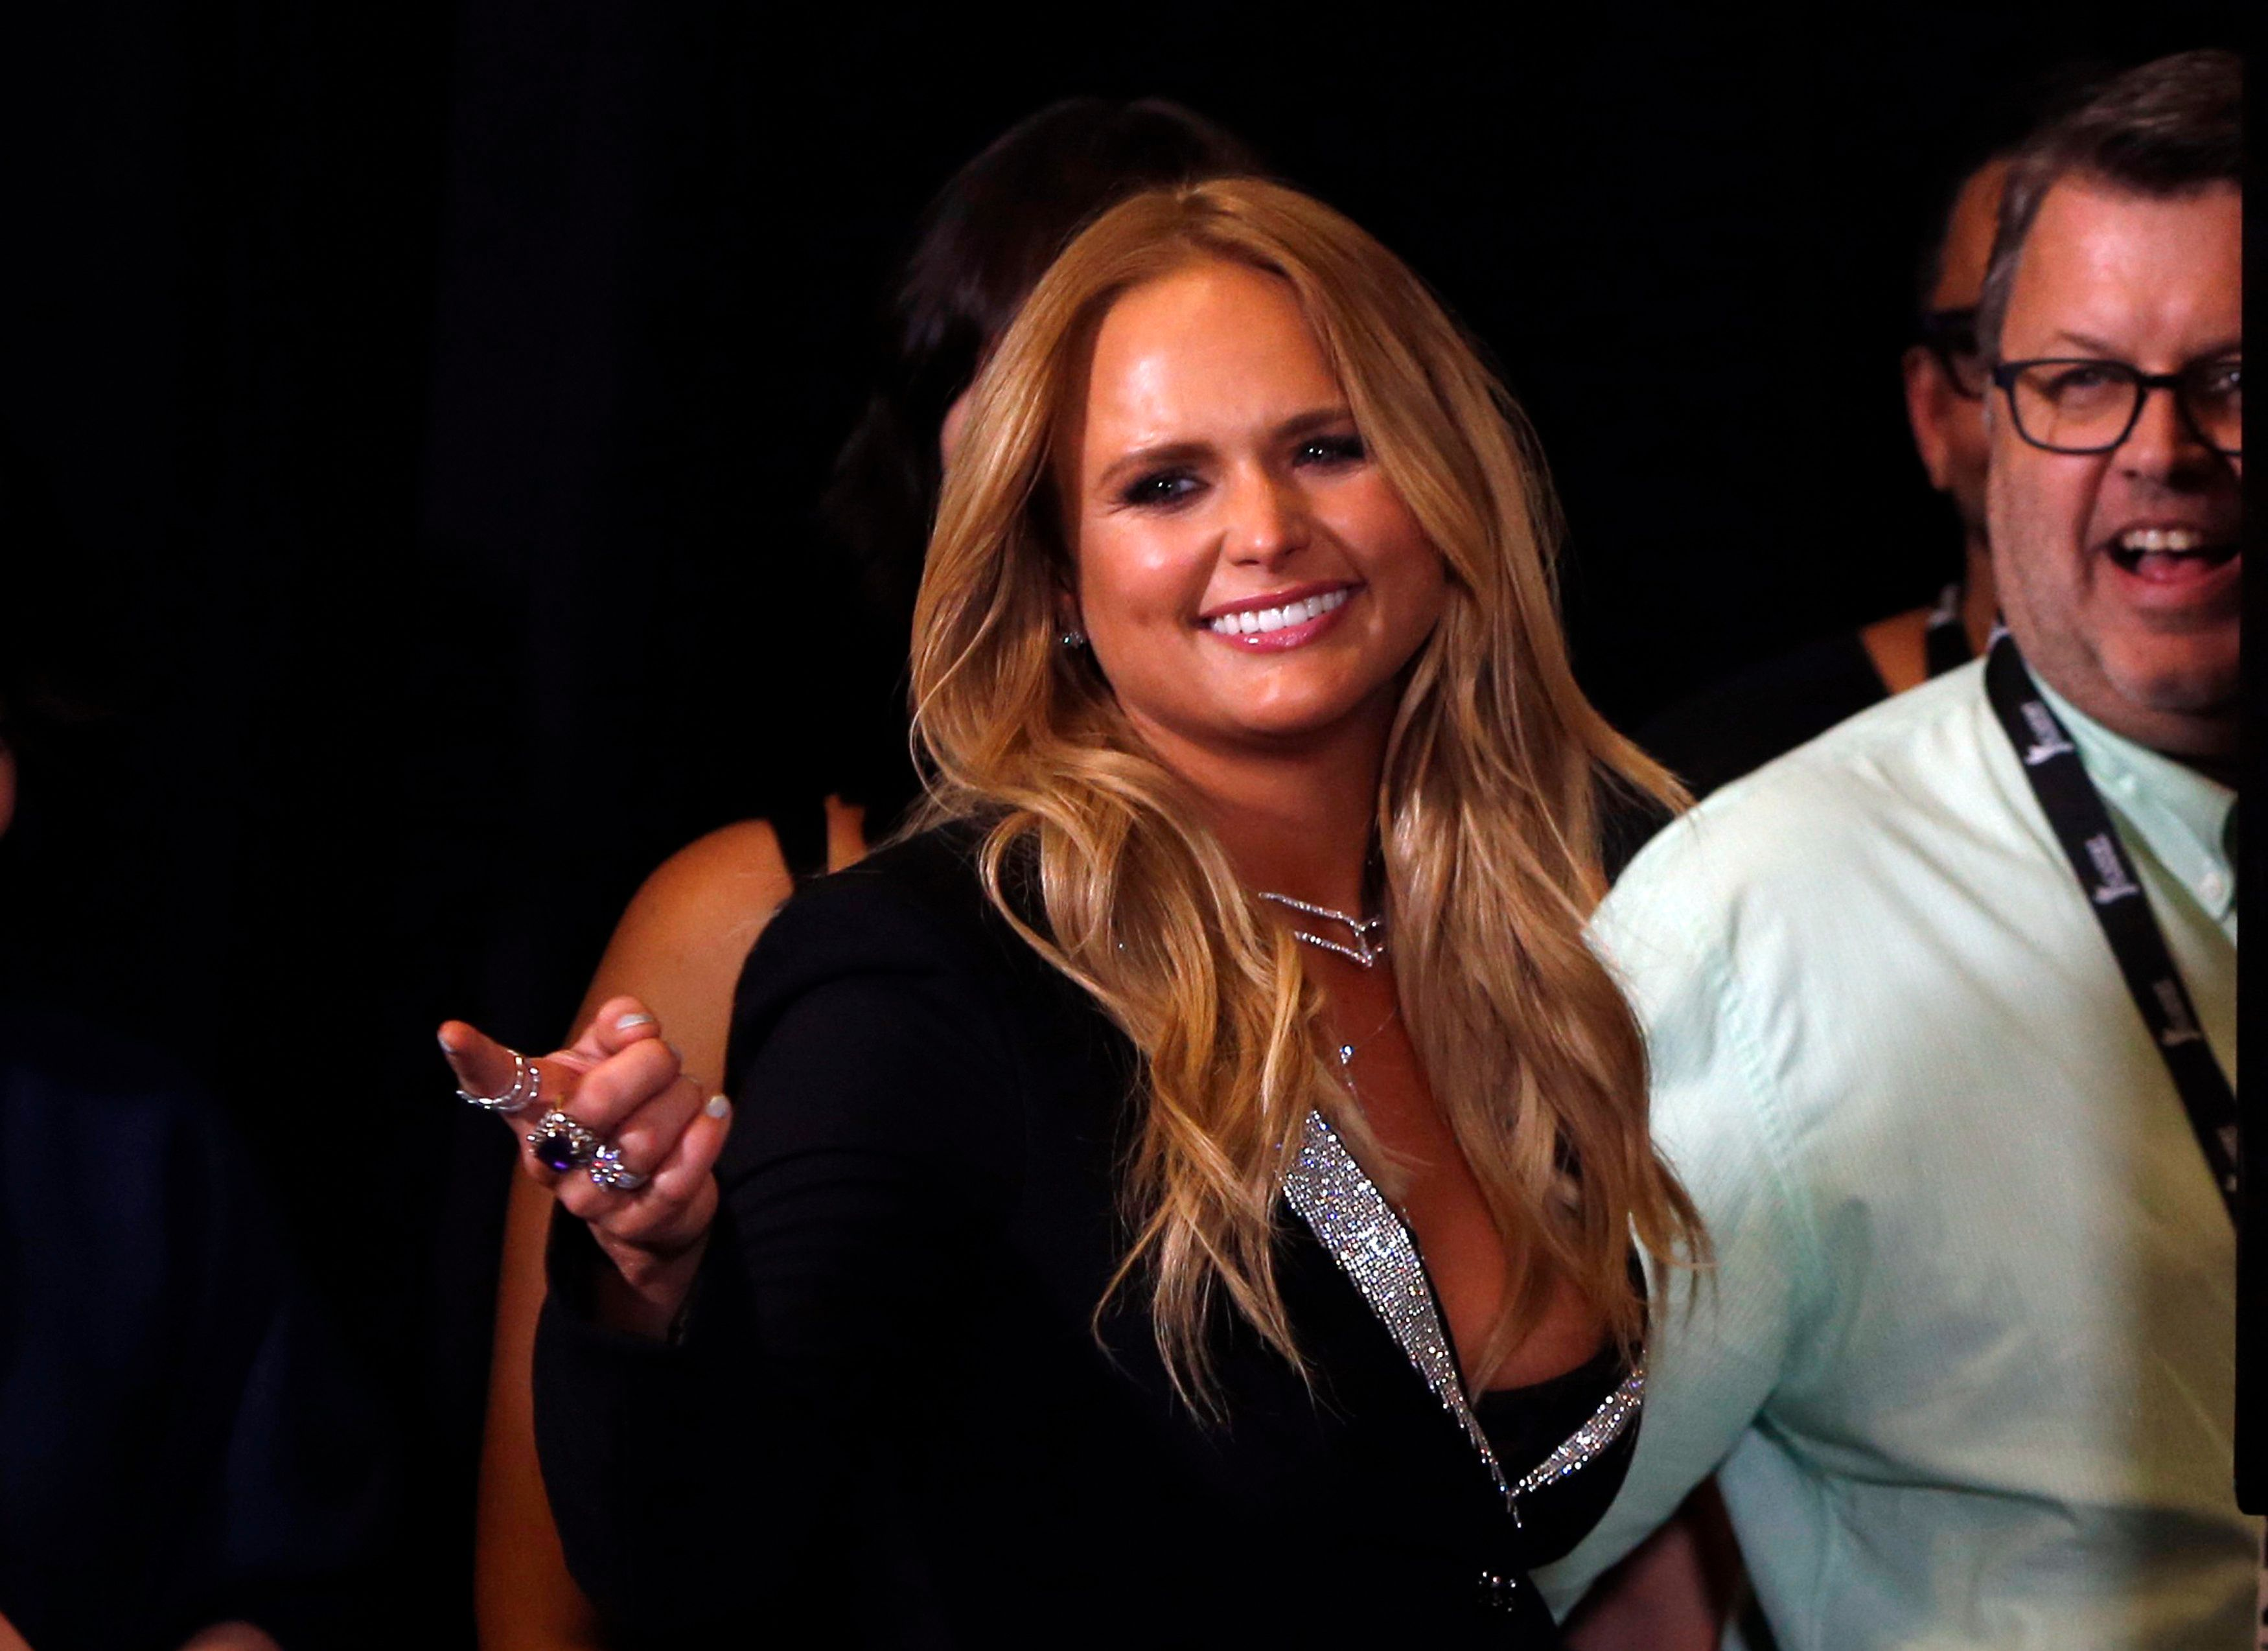 52nd Academy of Country Music Awards - Photo Room - Las Vegas, Nevada, U.S., - 02/04/2017 - Singer Miranda Lambert. REUTERS/Steve Marcus